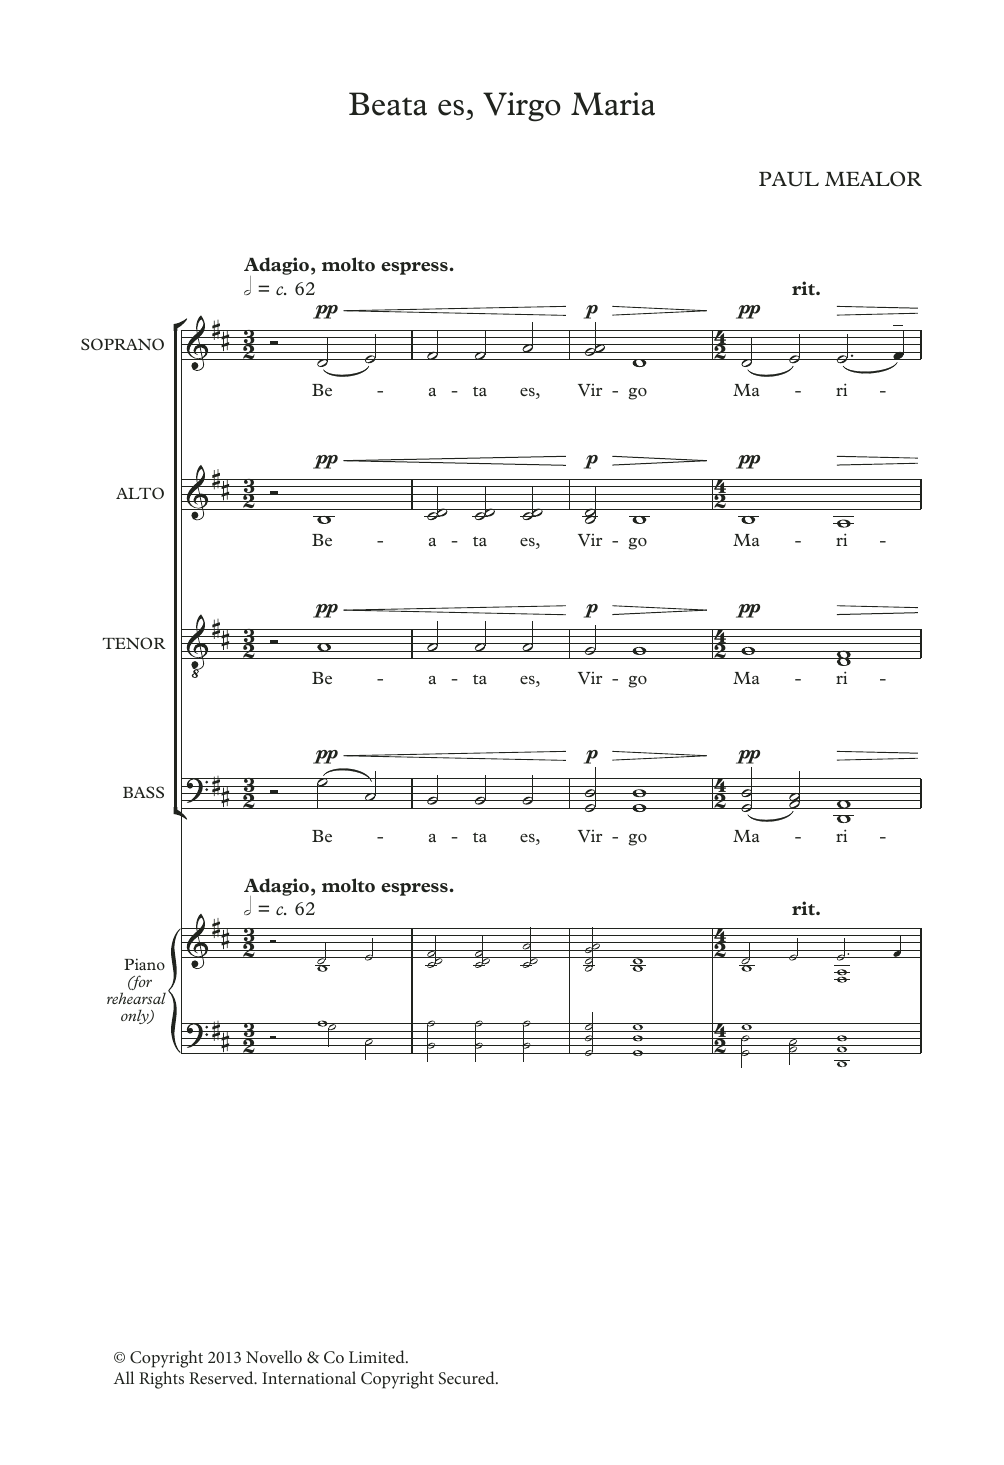 Paul Mealor Beata Es Virgo Maria sheet music notes and chords. Download Printable PDF.